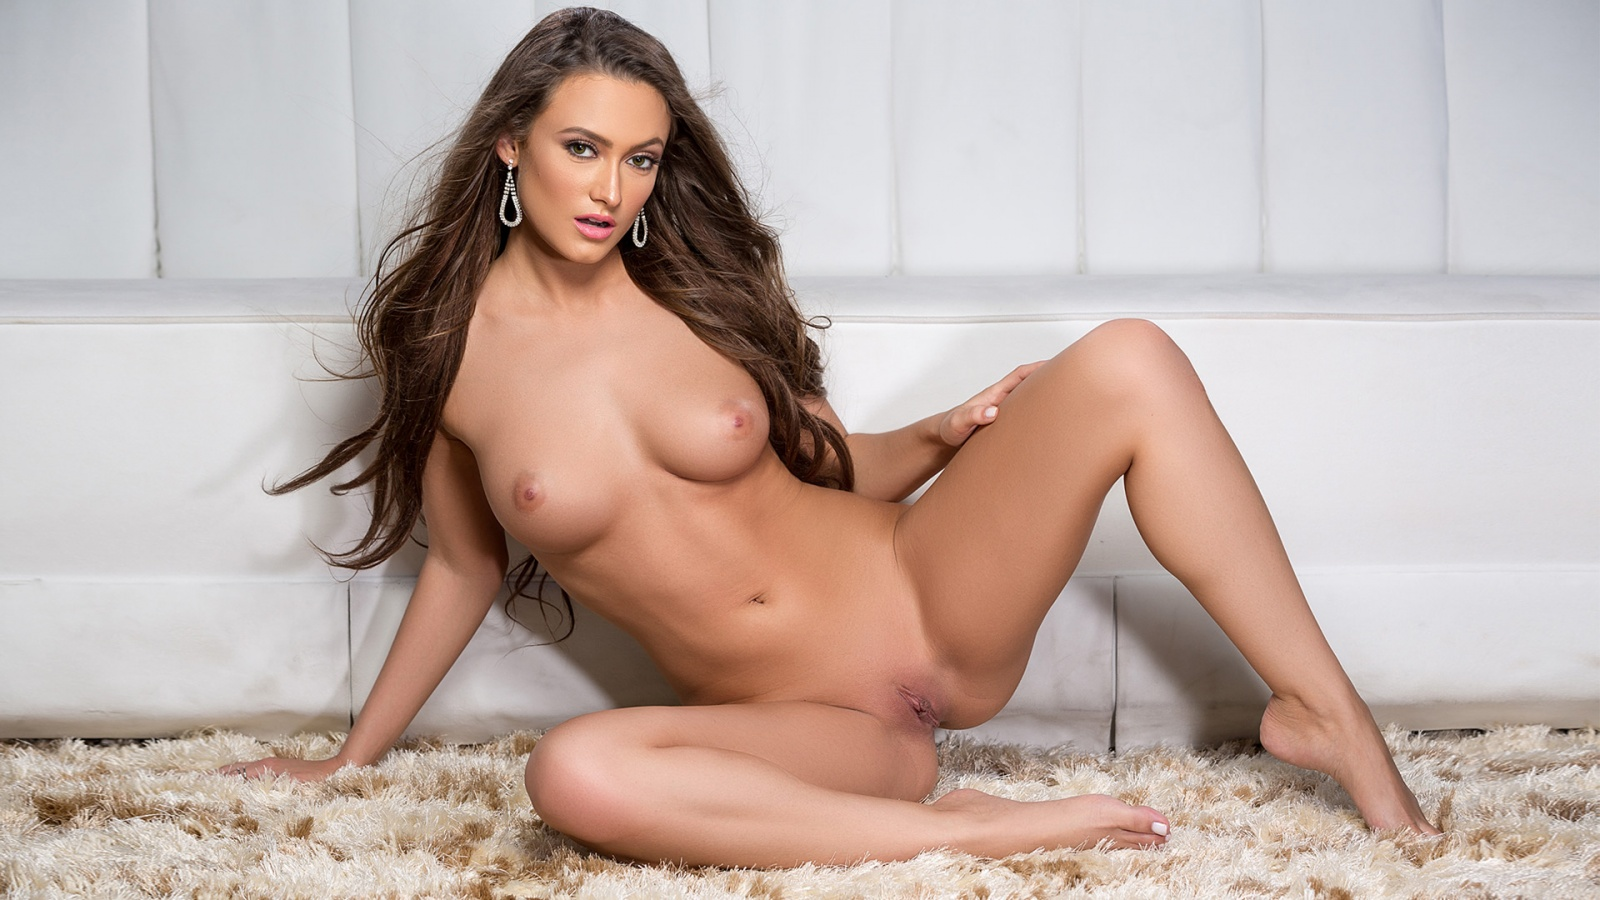 Naked playmate